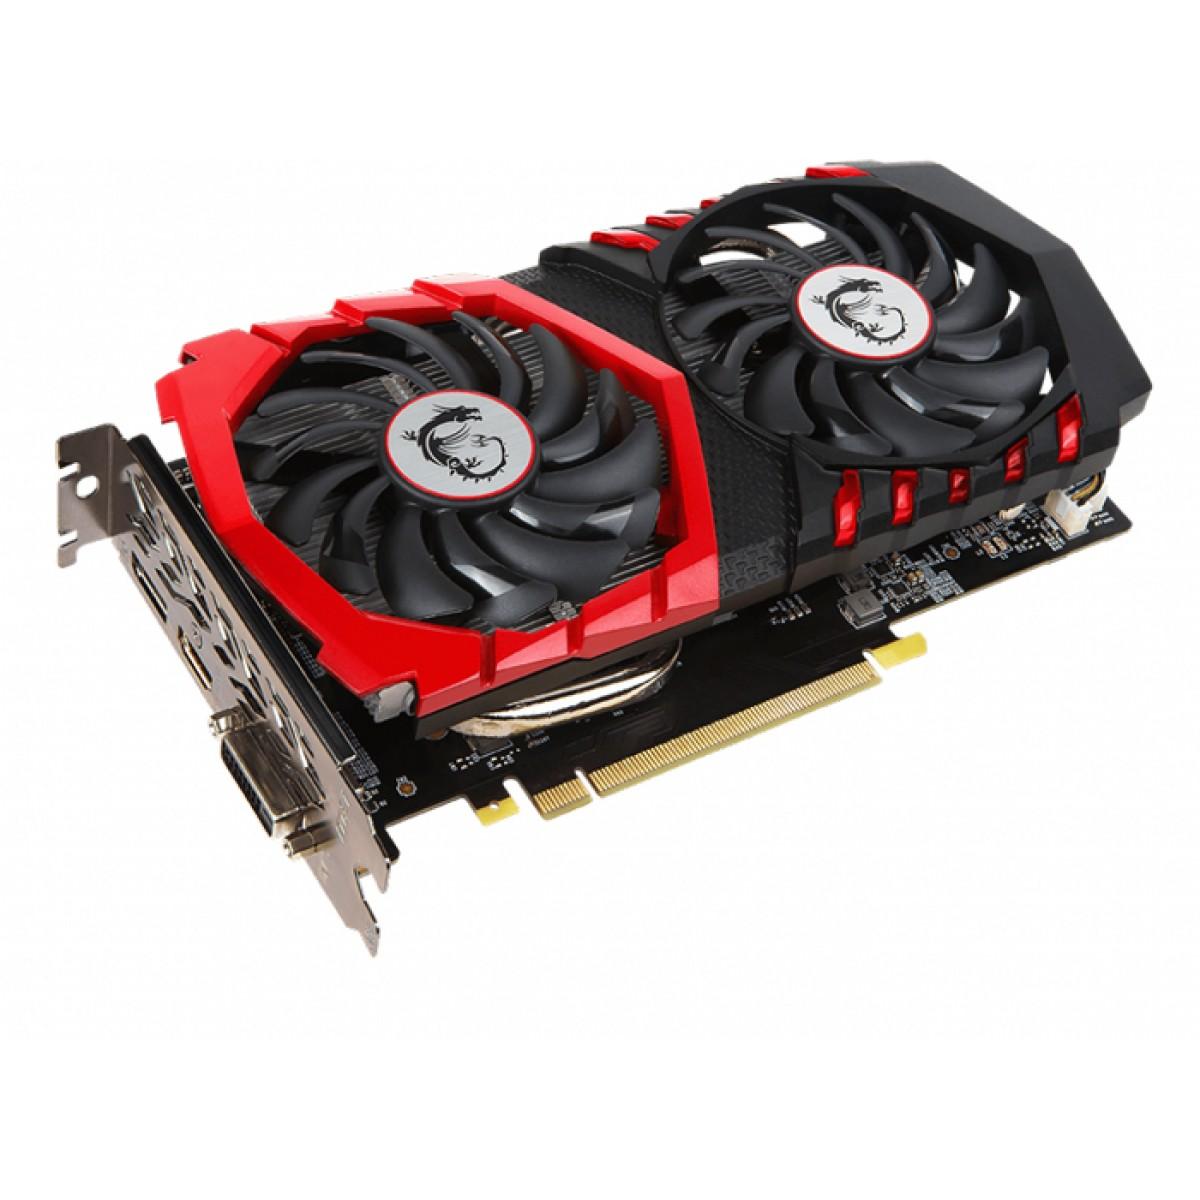 Placa de Vídeo MSI GeForce GTX 1050 TI GAMING X 4G GDDR5 4GB PCI-EXP